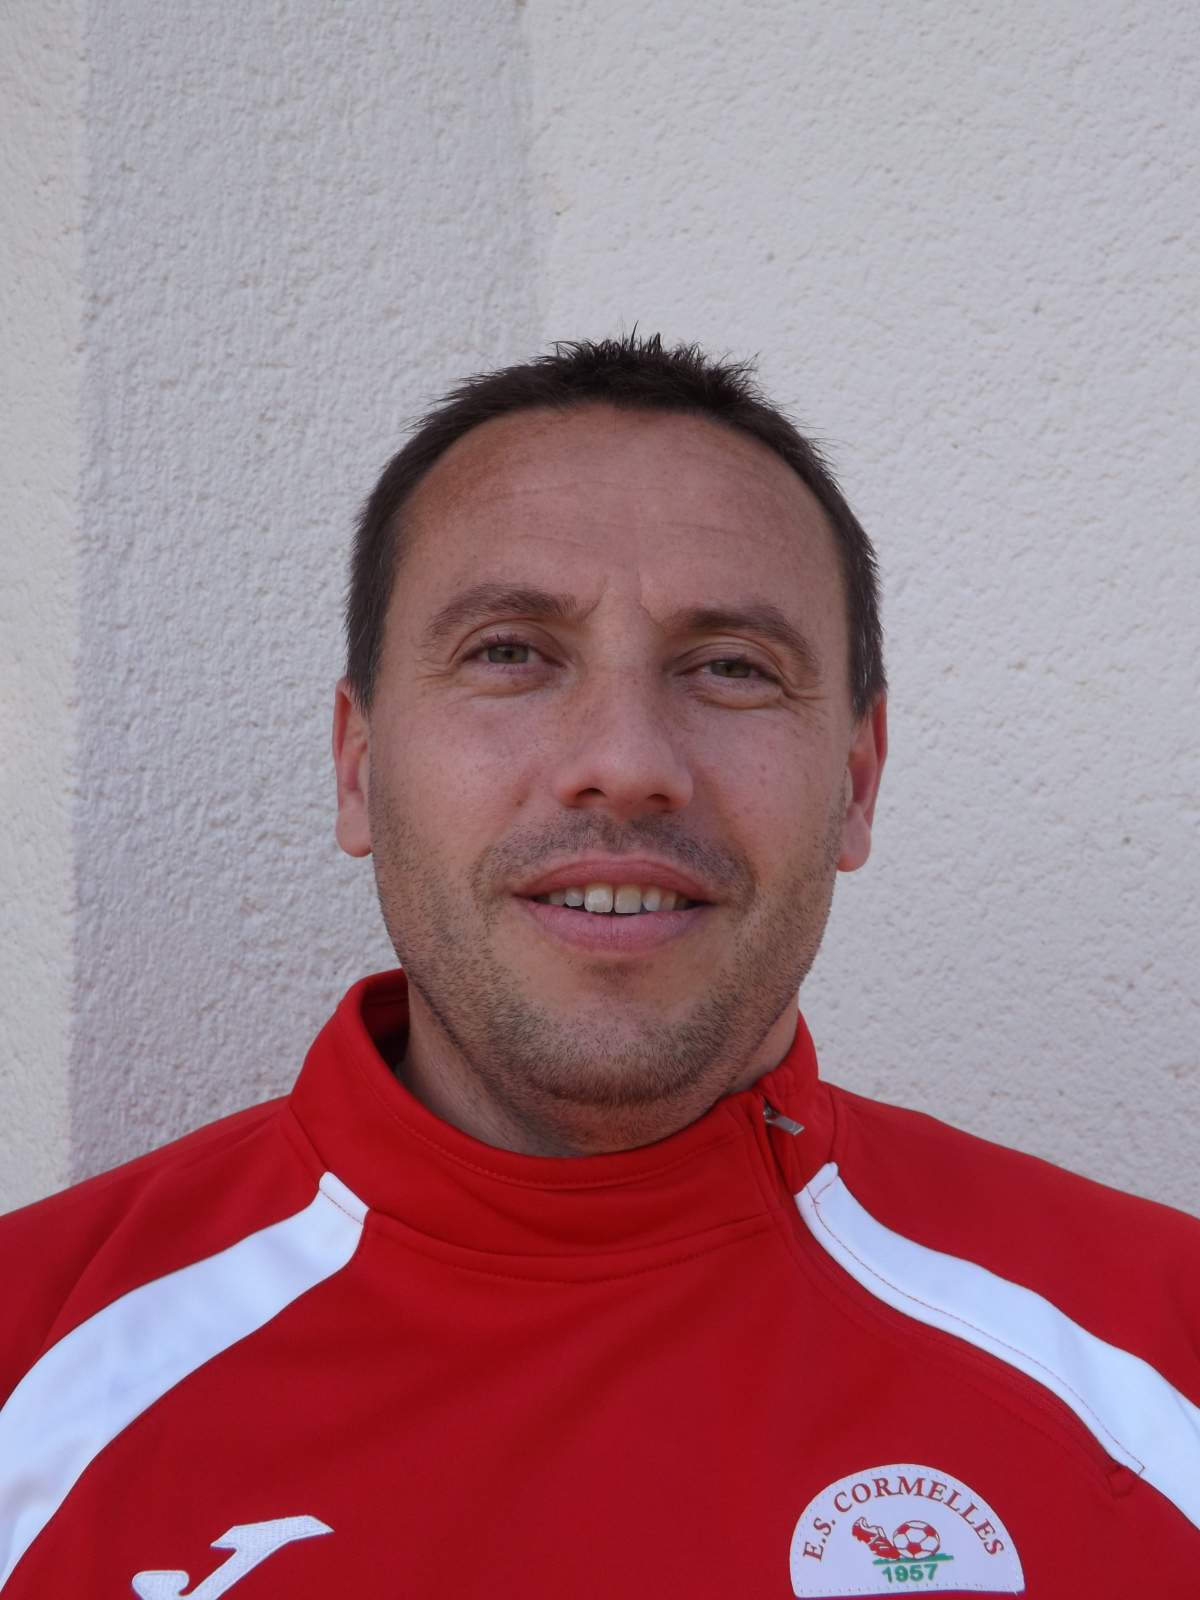 Joueur - <b>Olivier LEMESLE</b> - club Football E.S.CORMELLES FOOTBALL - Footeo - olivier-lemesle-2__o7hsor